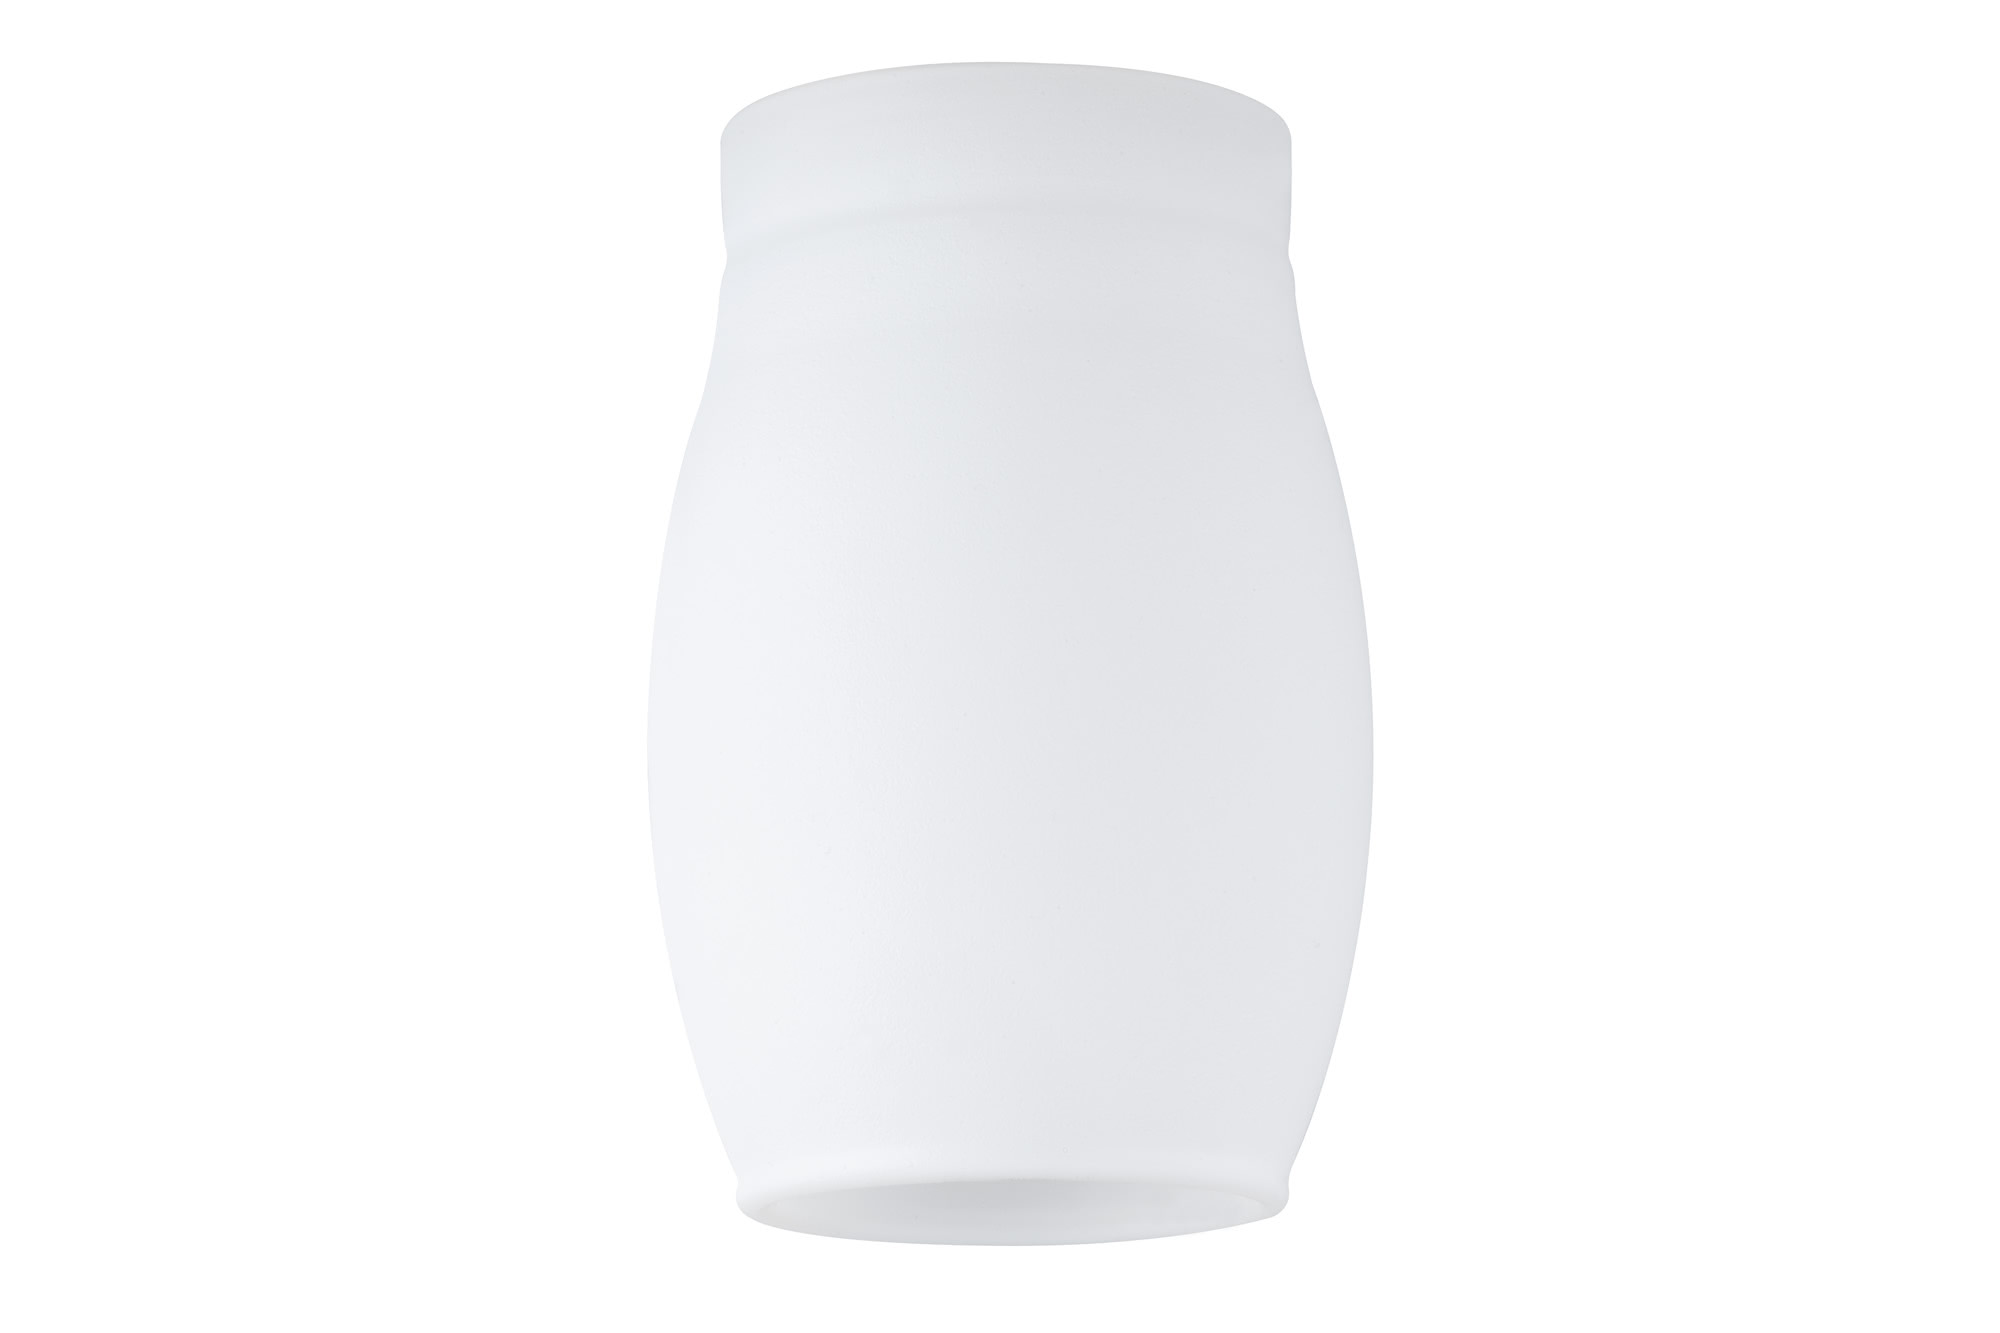 Paulmann. 92574 Плафон для DecoSystems Cocone, satin,стекло